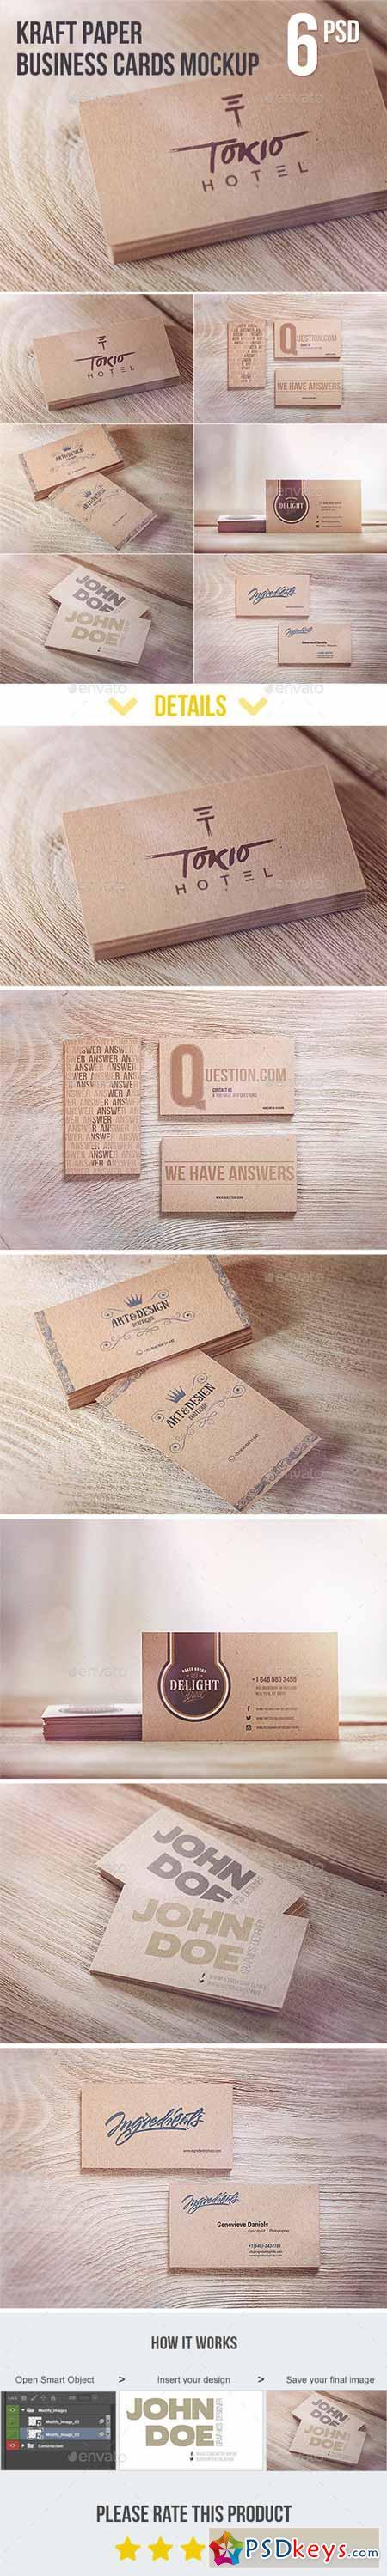 Kraft paper business cards mockup 11406178 free download kraft paper business cards mockup 11406178 magicingreecefo Gallery